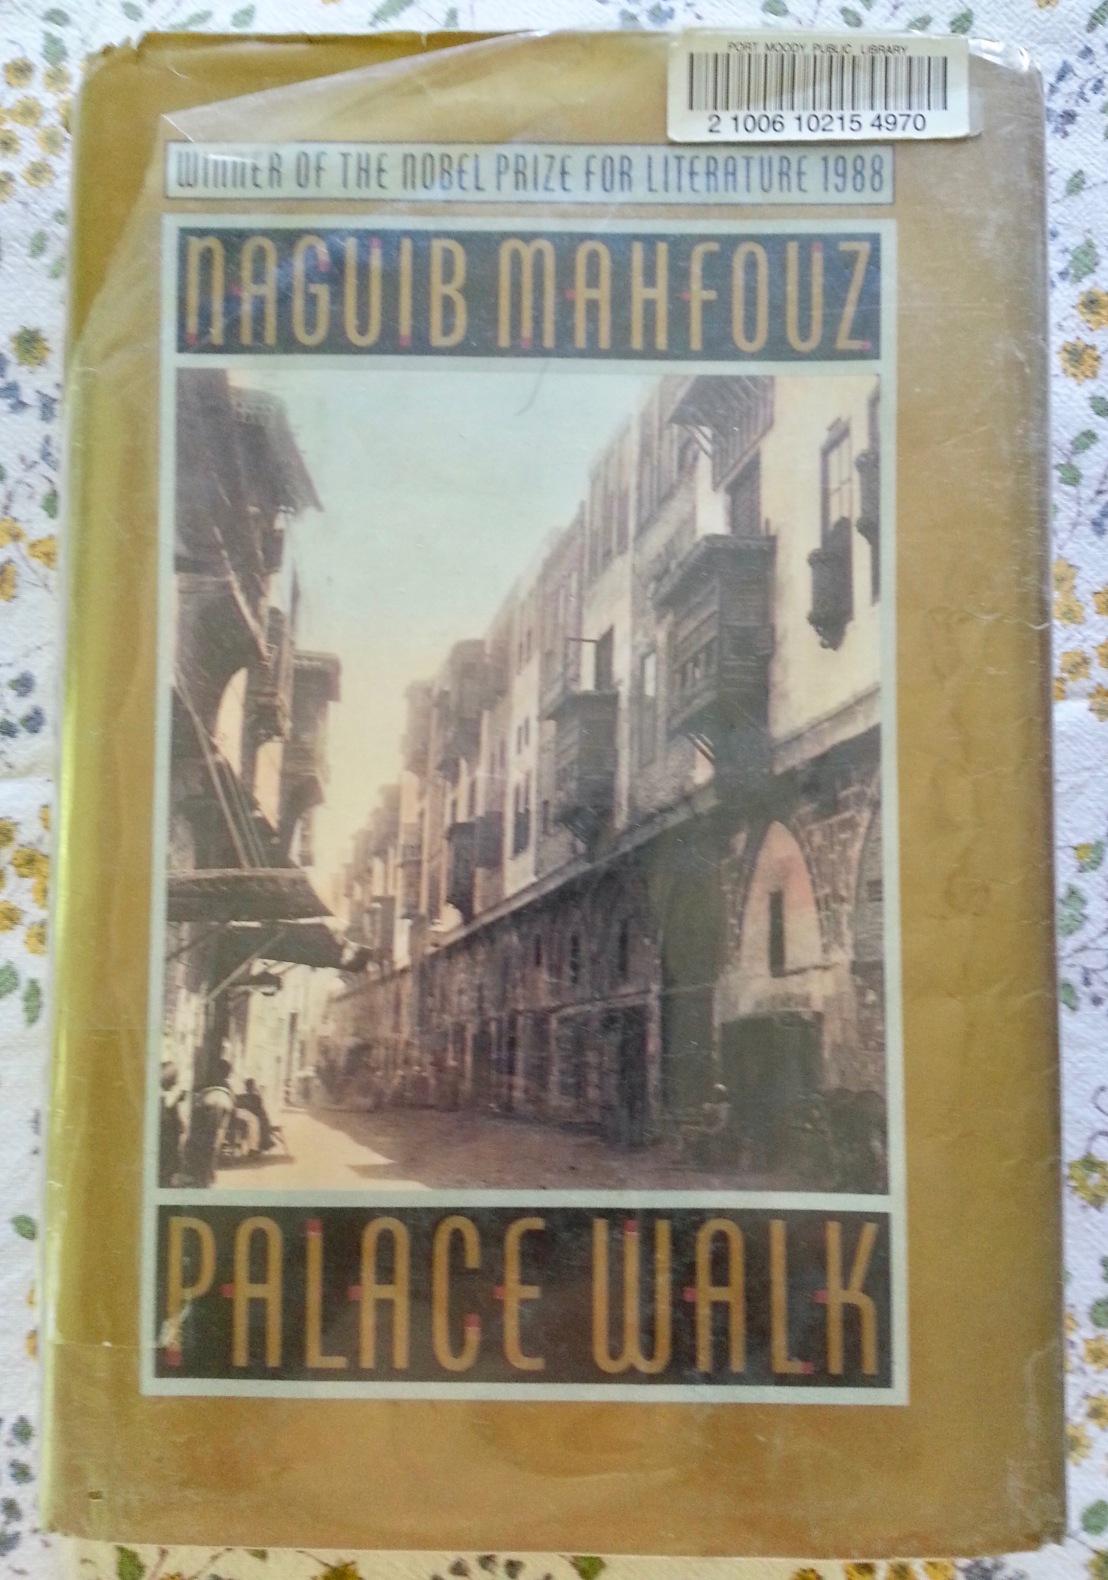 Naguib Mahfouz's — PalaceWalk